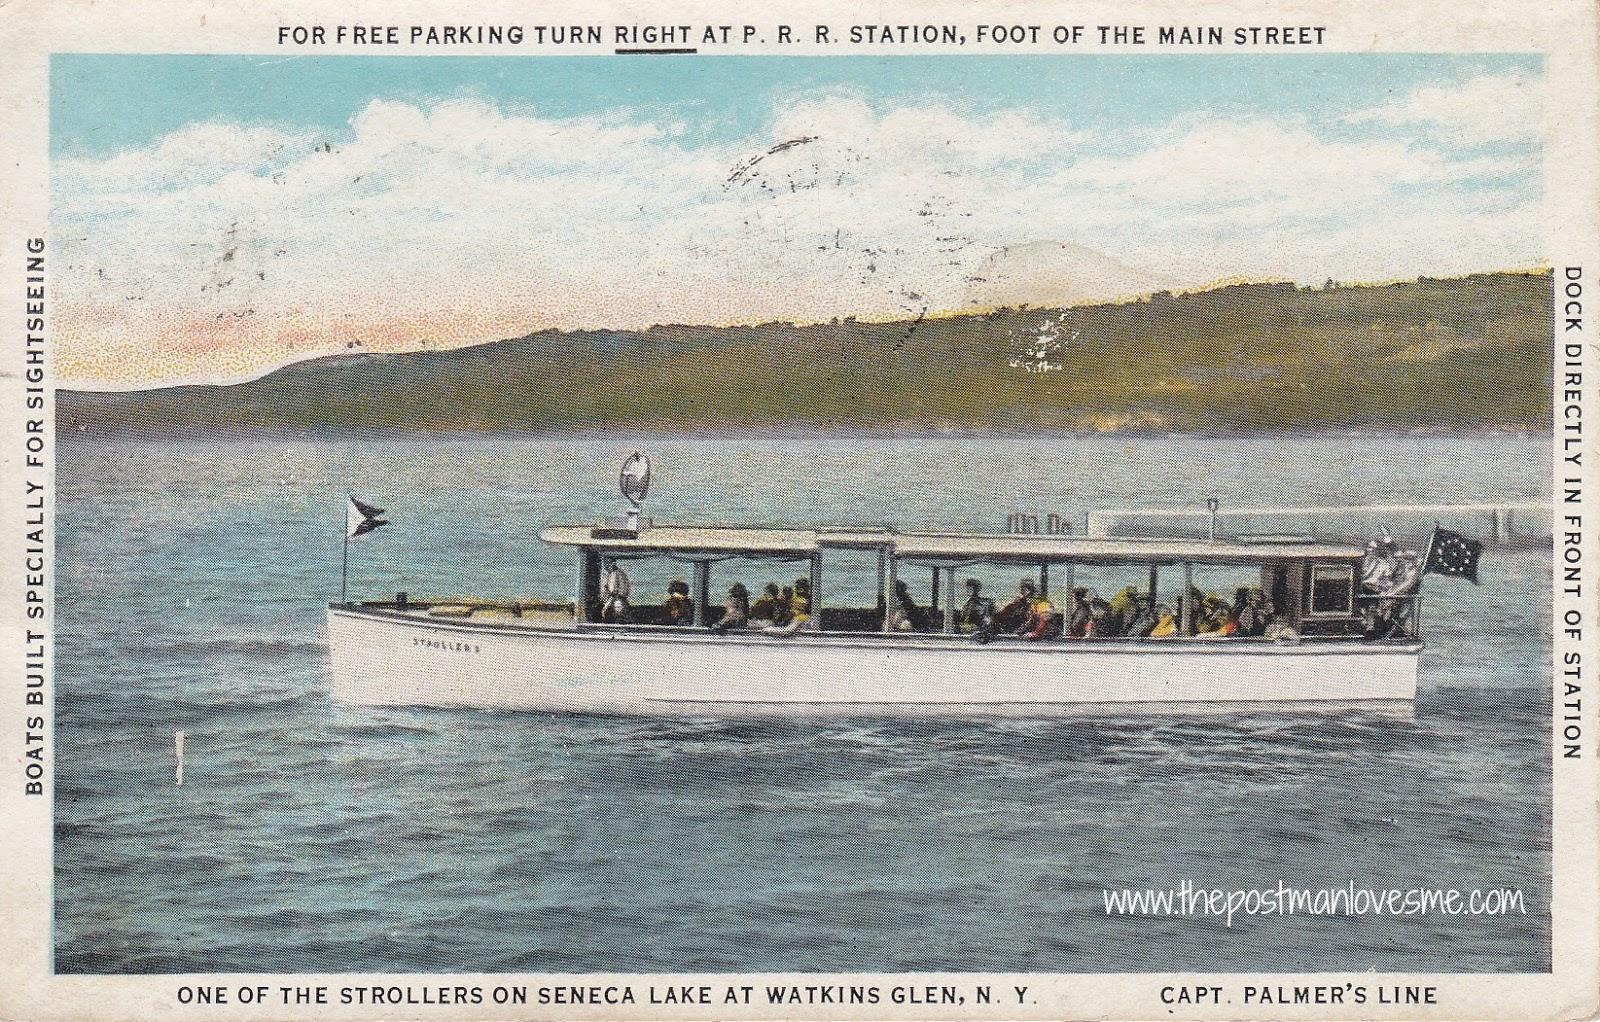 Vintage postcard - Stroller on Seneca Lake at Watkins Glen, NY